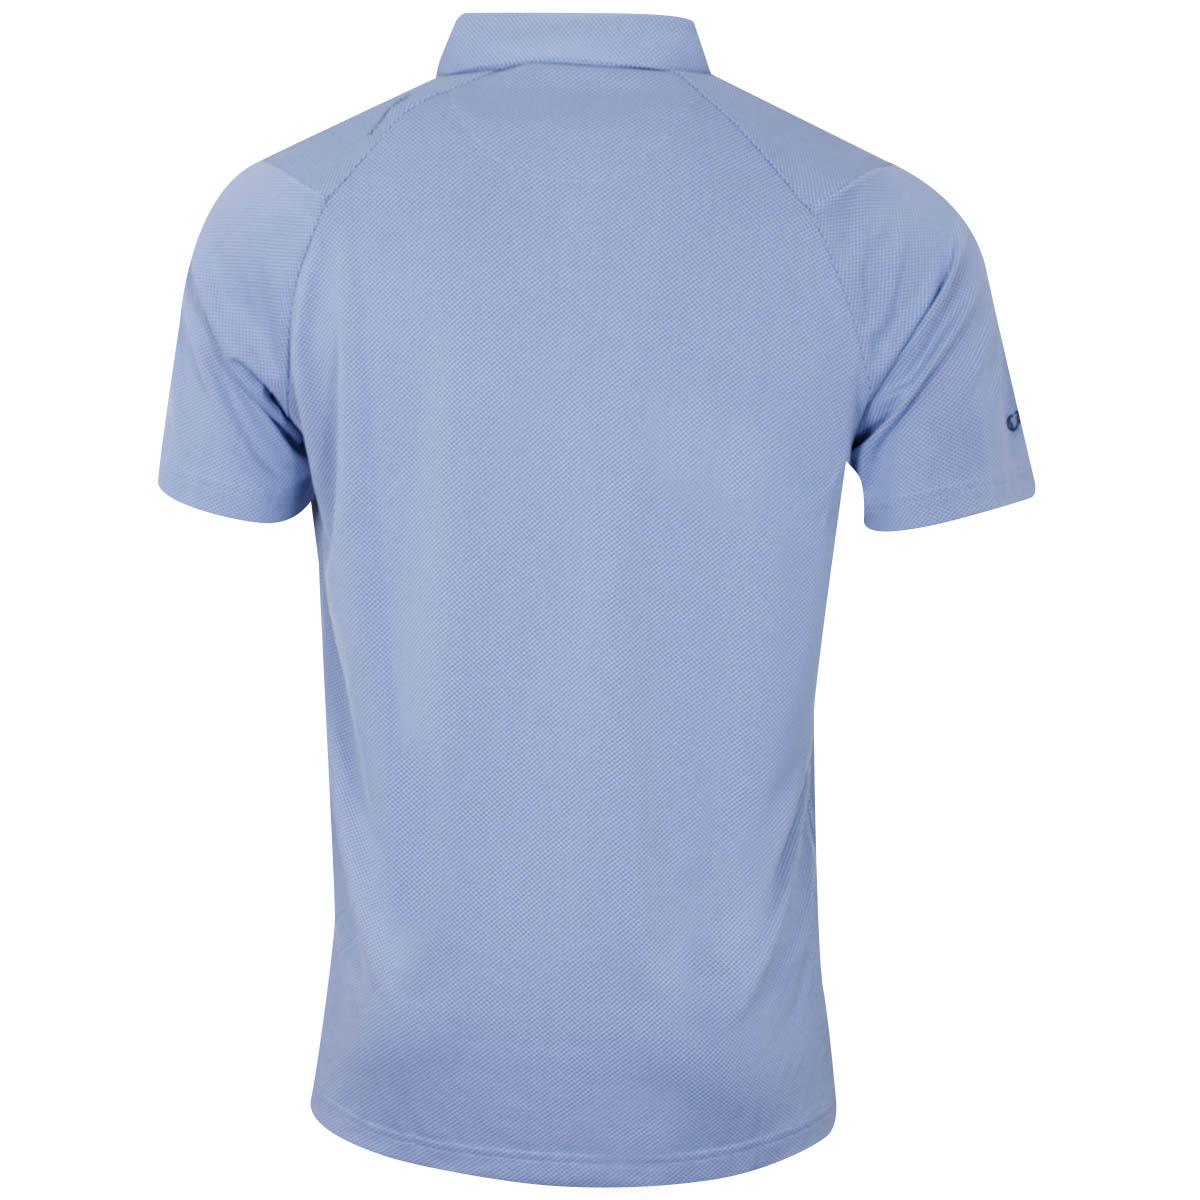 Callaway-Mens-New-Box-Jacquard-Tour-Opti-Dri-Golf-Polo-Shirt-45-OFF-RRP thumbnail 3